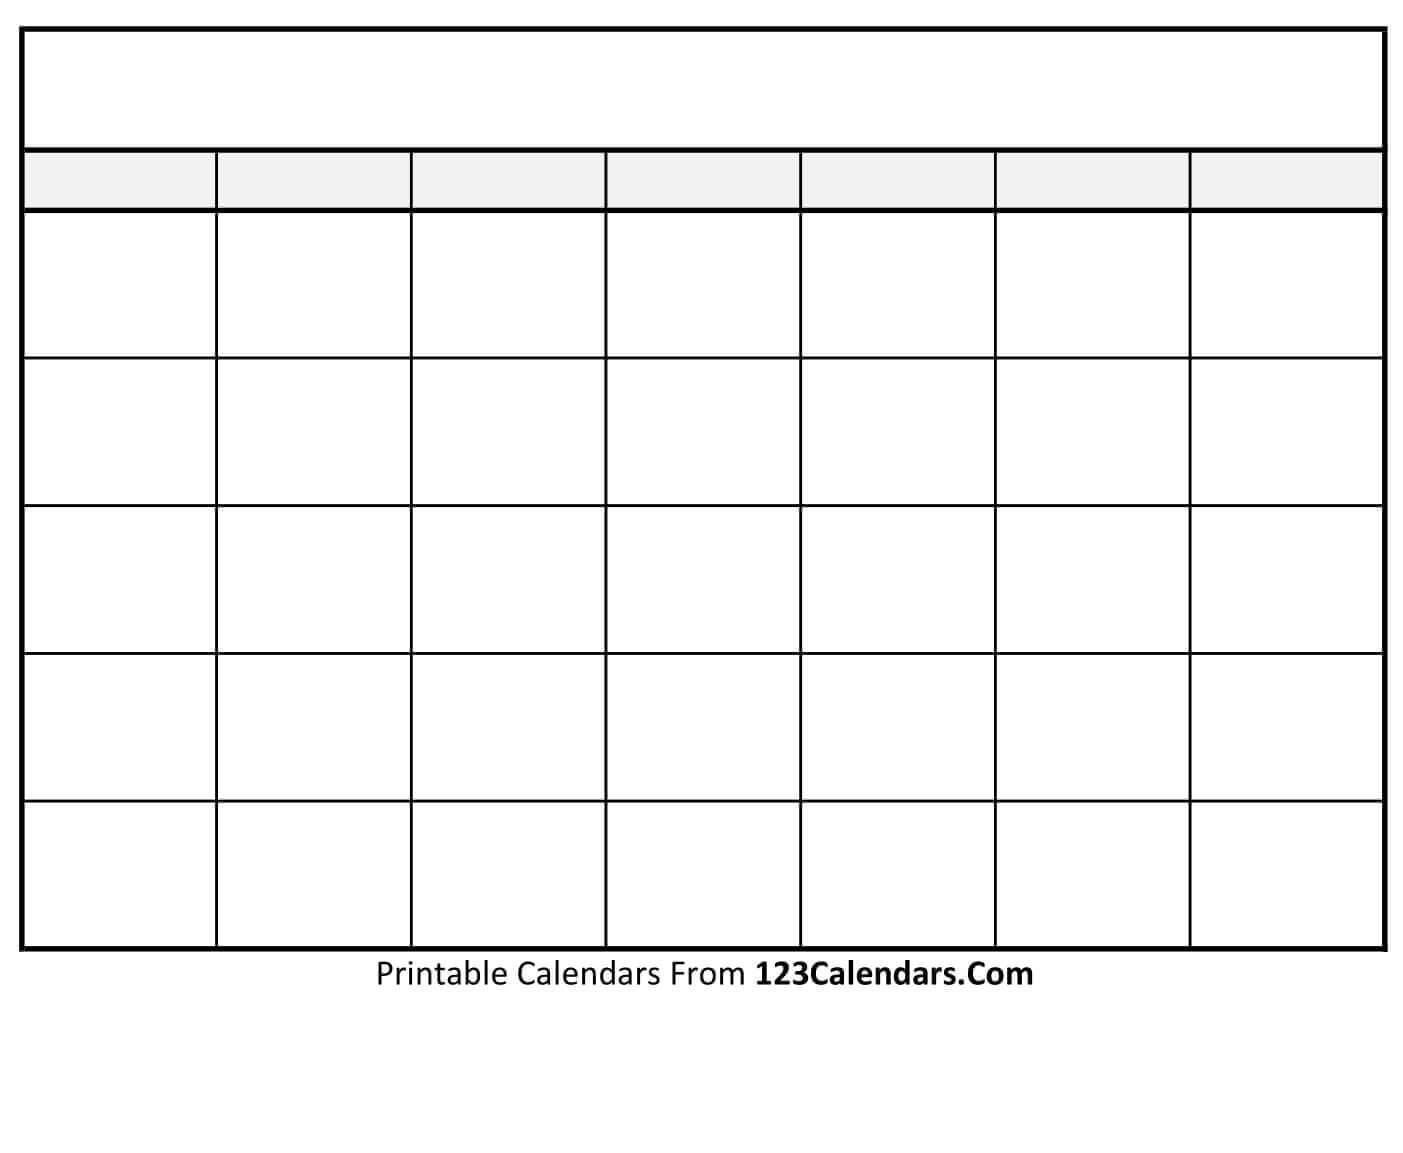 Free Printable Blank Calendar   123Calendars pertaining to Blank Calender Template